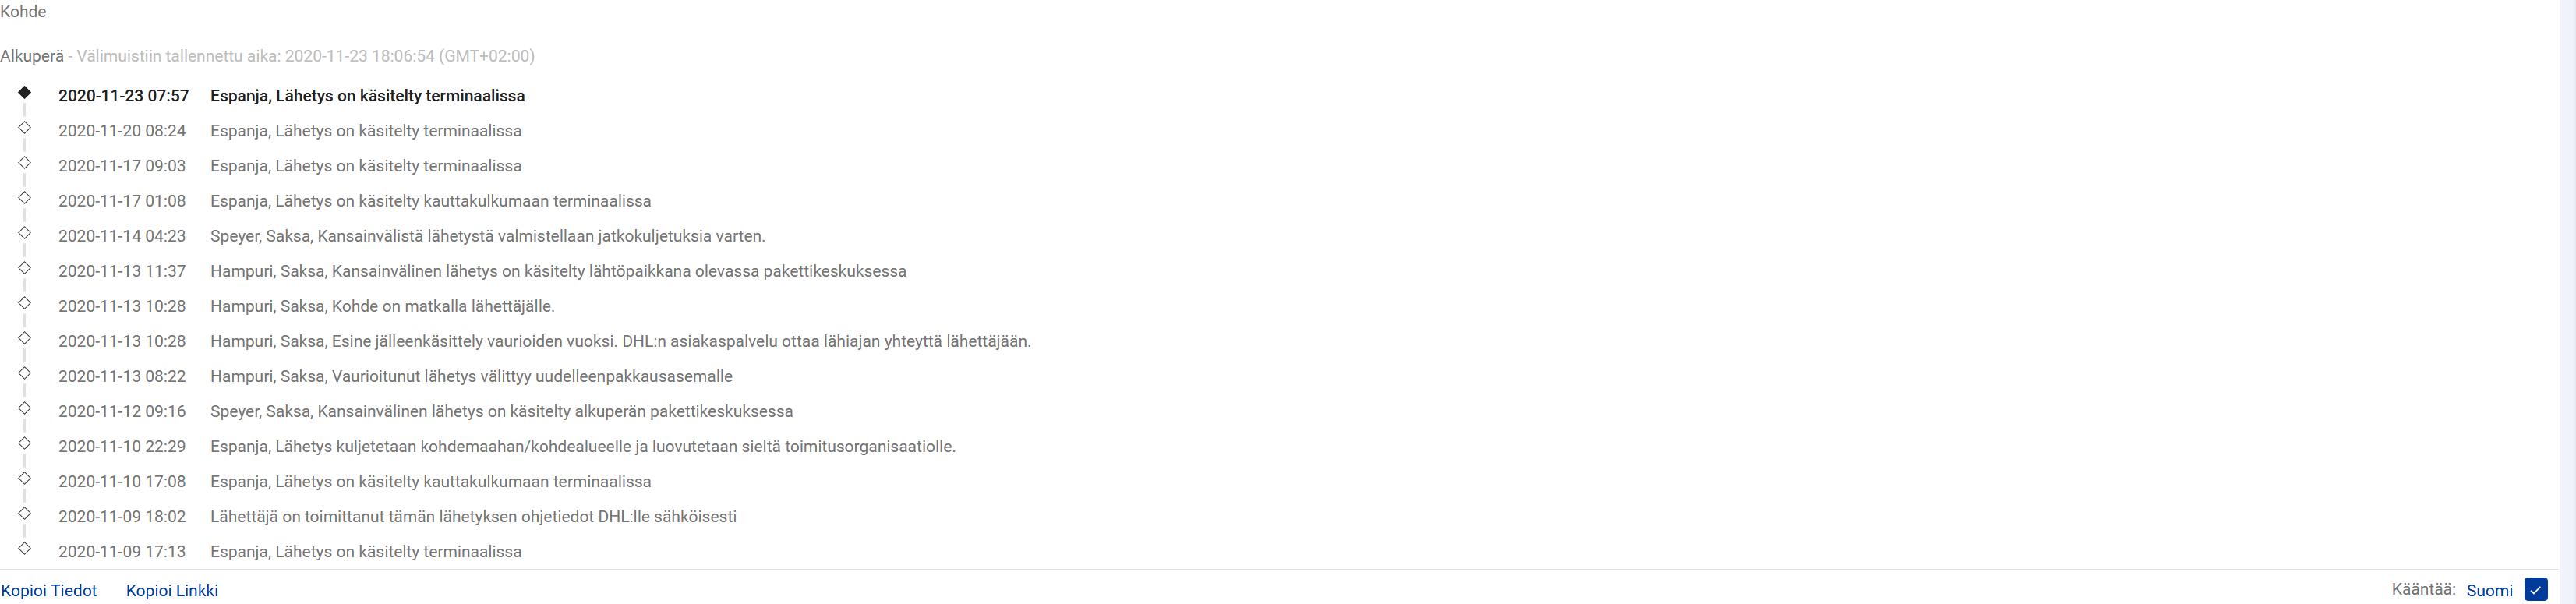 Screenshot_2020-11-23 MONIPUOLINEN LÄHETYSTEN SEURANTA 17TRACK.png